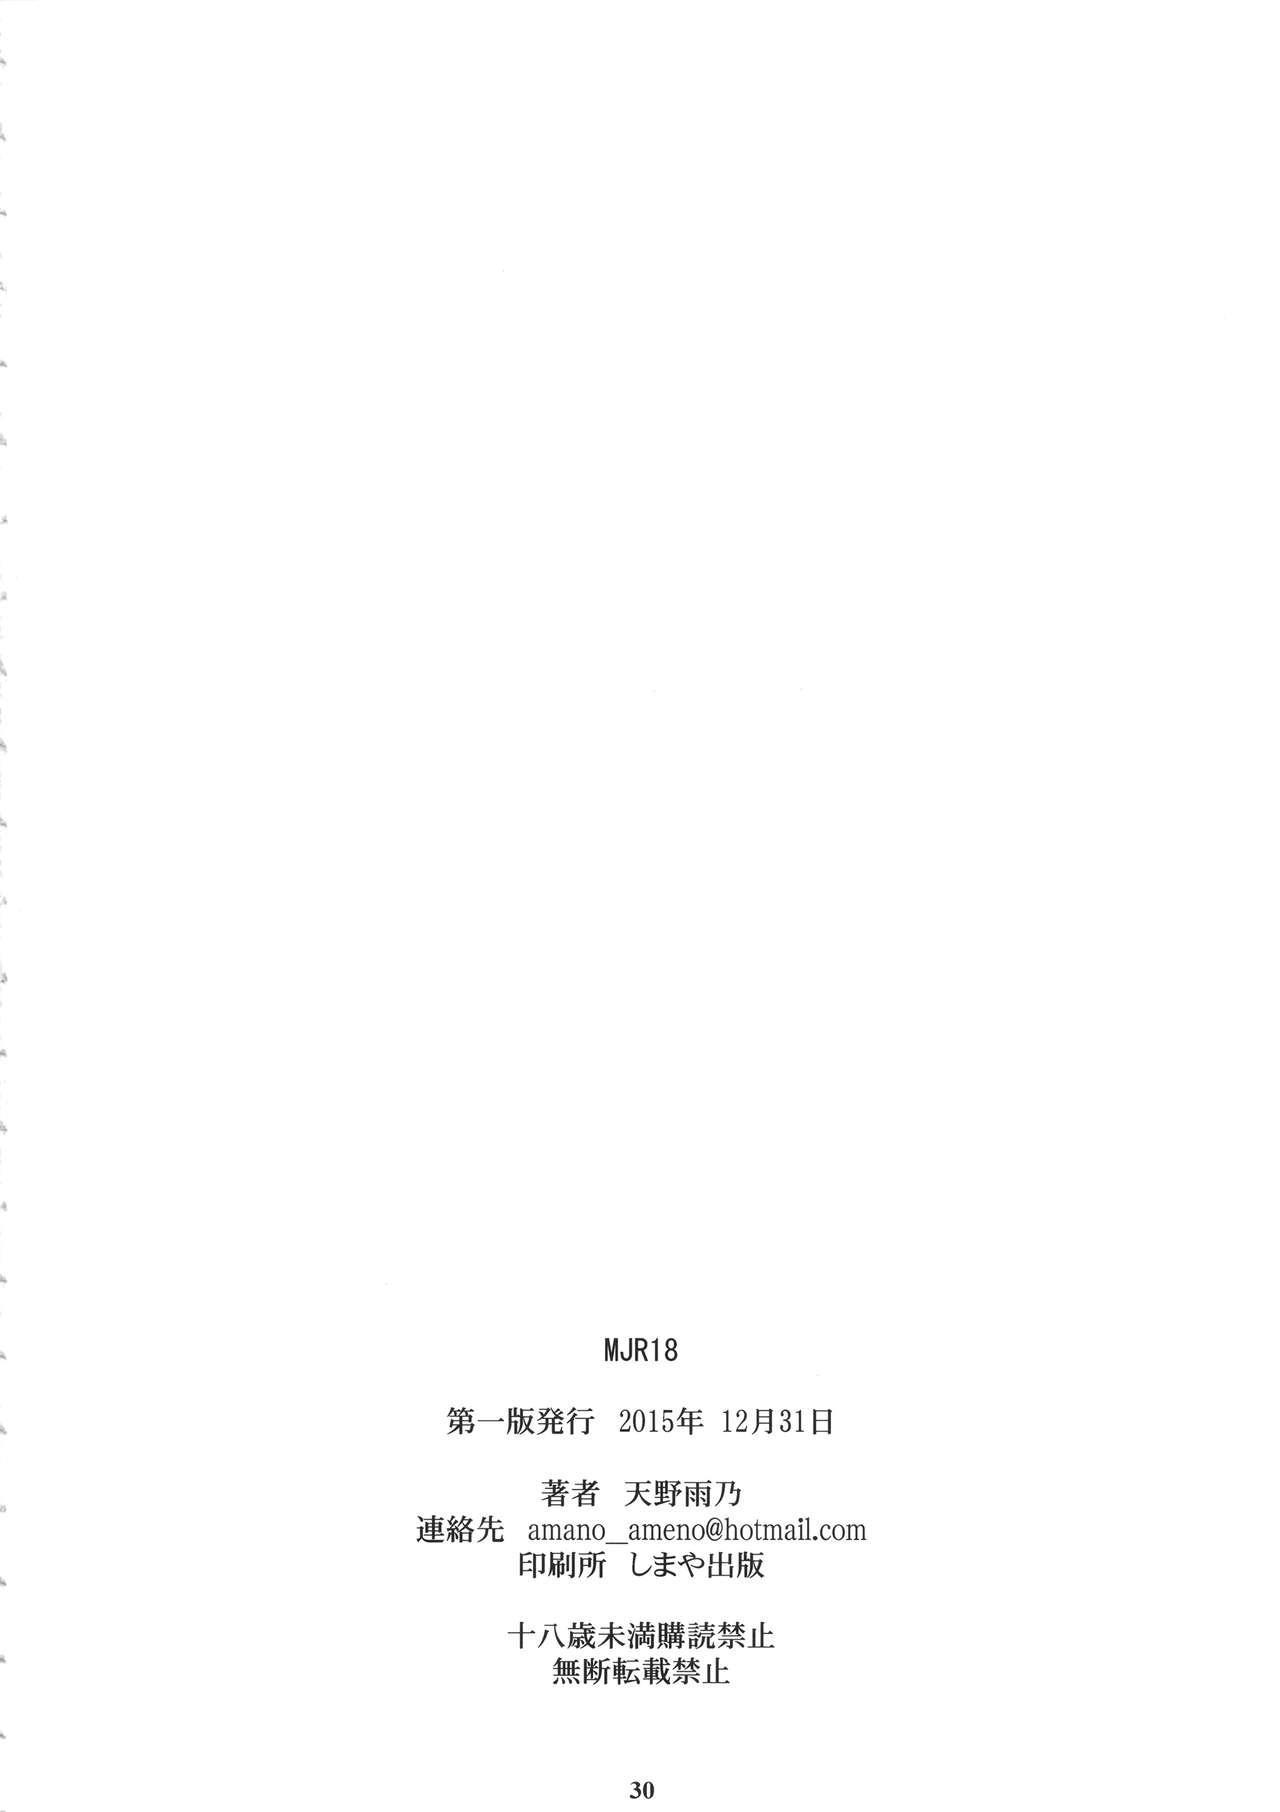 MJR18 28